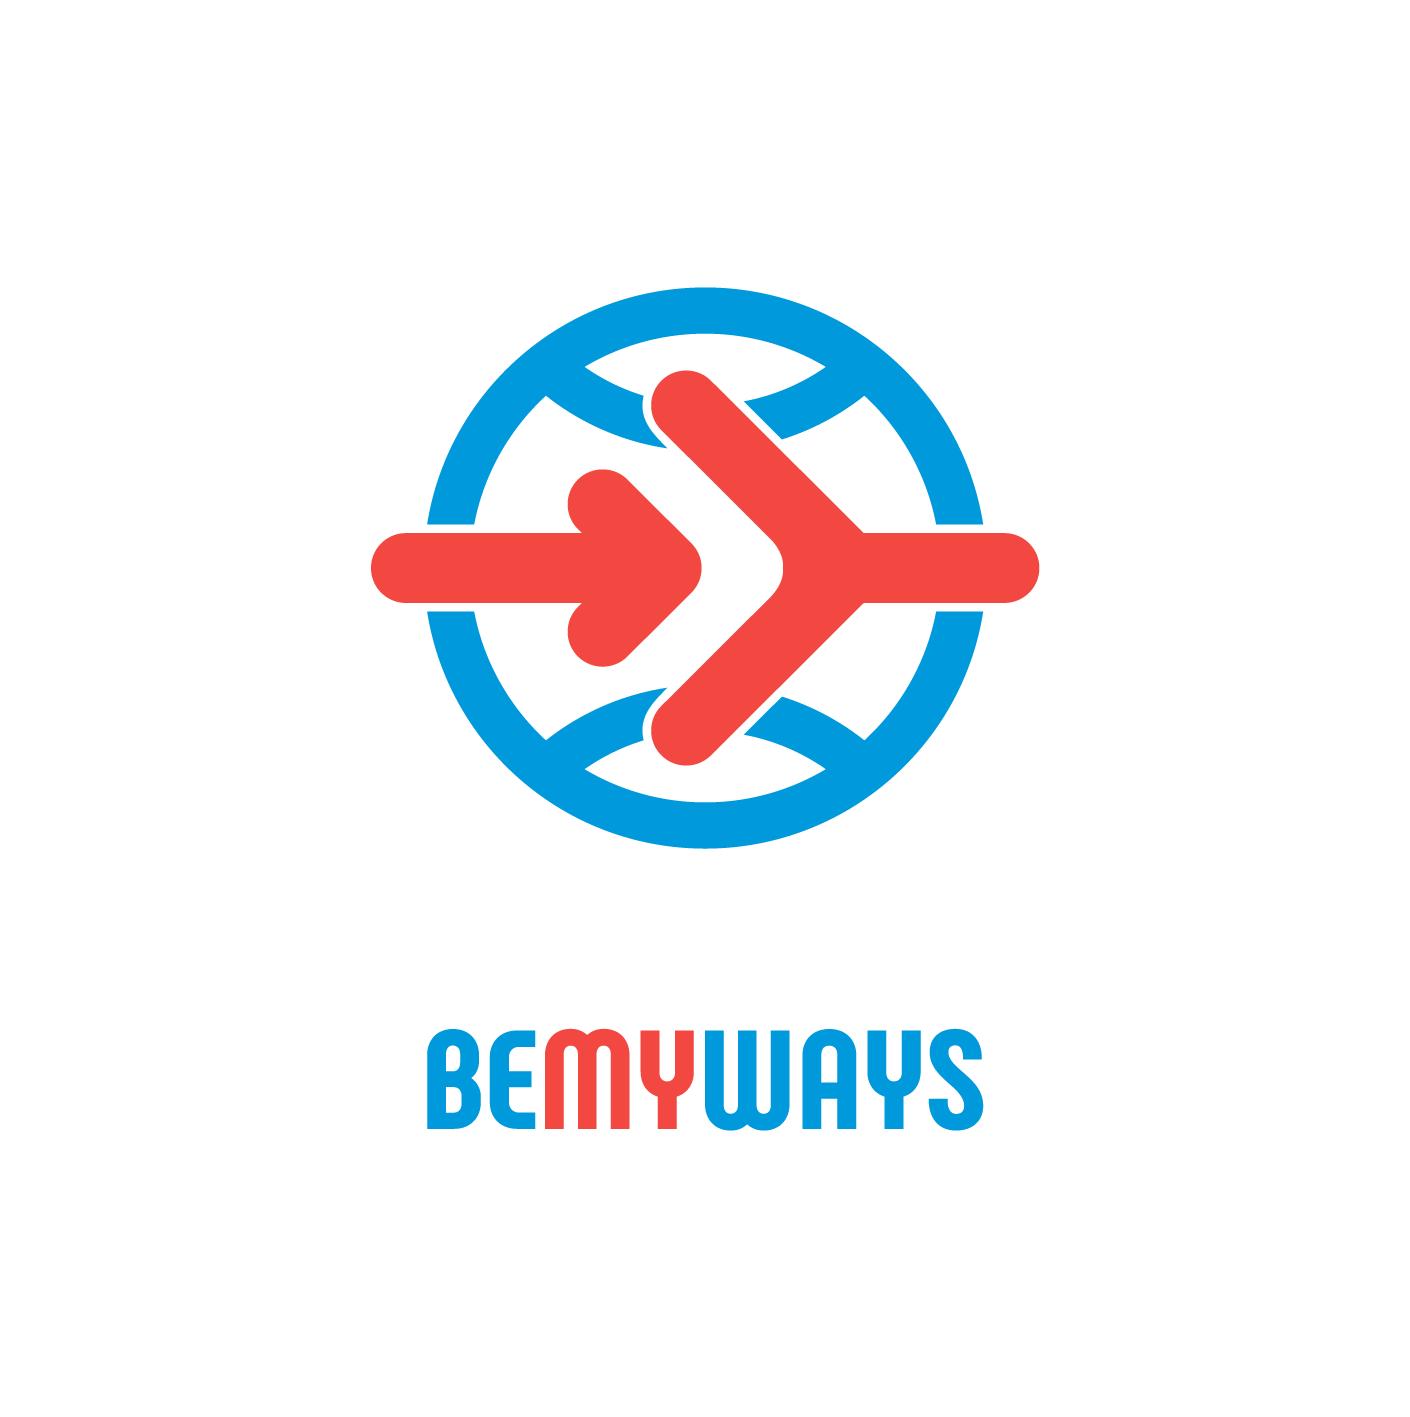 Разработка логотипа и иконки для Travel Video Platform фото f_6155c371a22b8df6.png